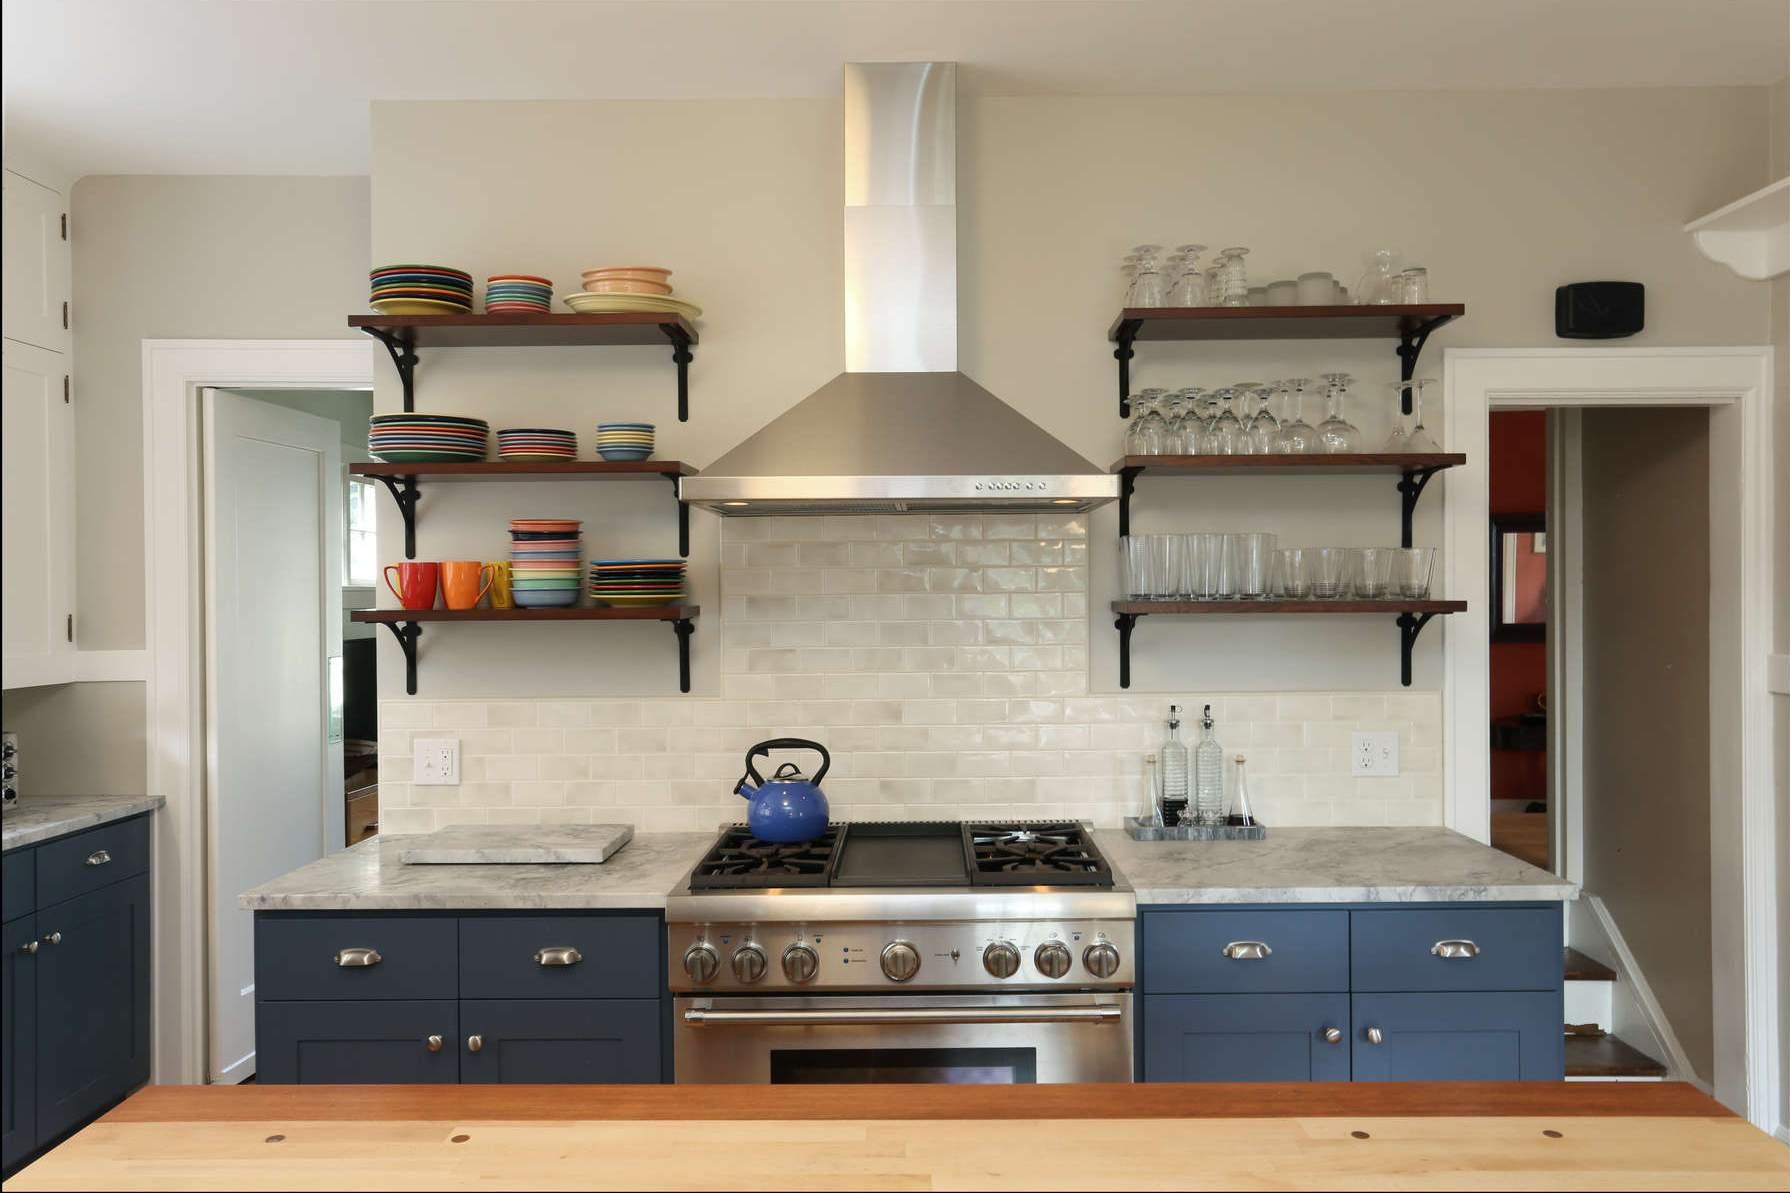 deaft blue west kitchen arch cabinets cabinet